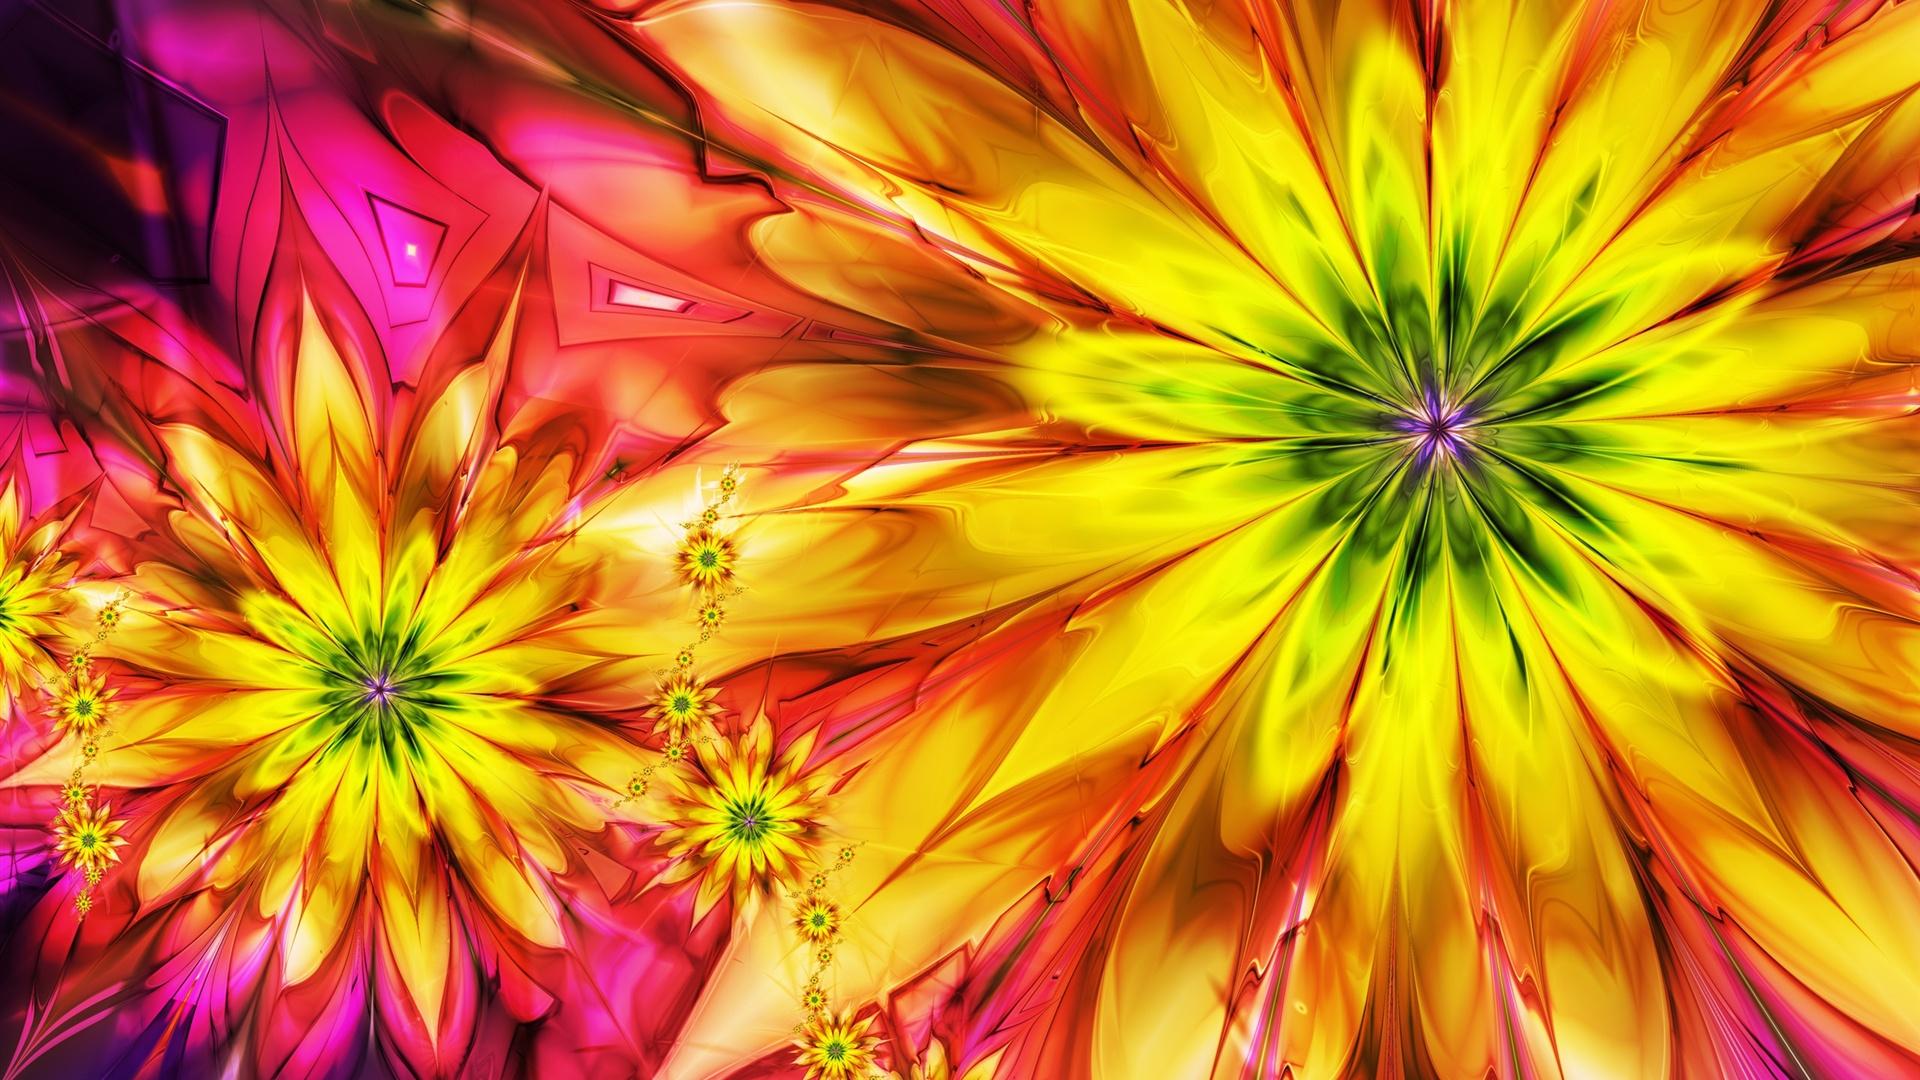 1920x1080 Abstracto Full Hd 1920x1080: Brillantes Flores De Colores Abstractos Fondos De Pantalla